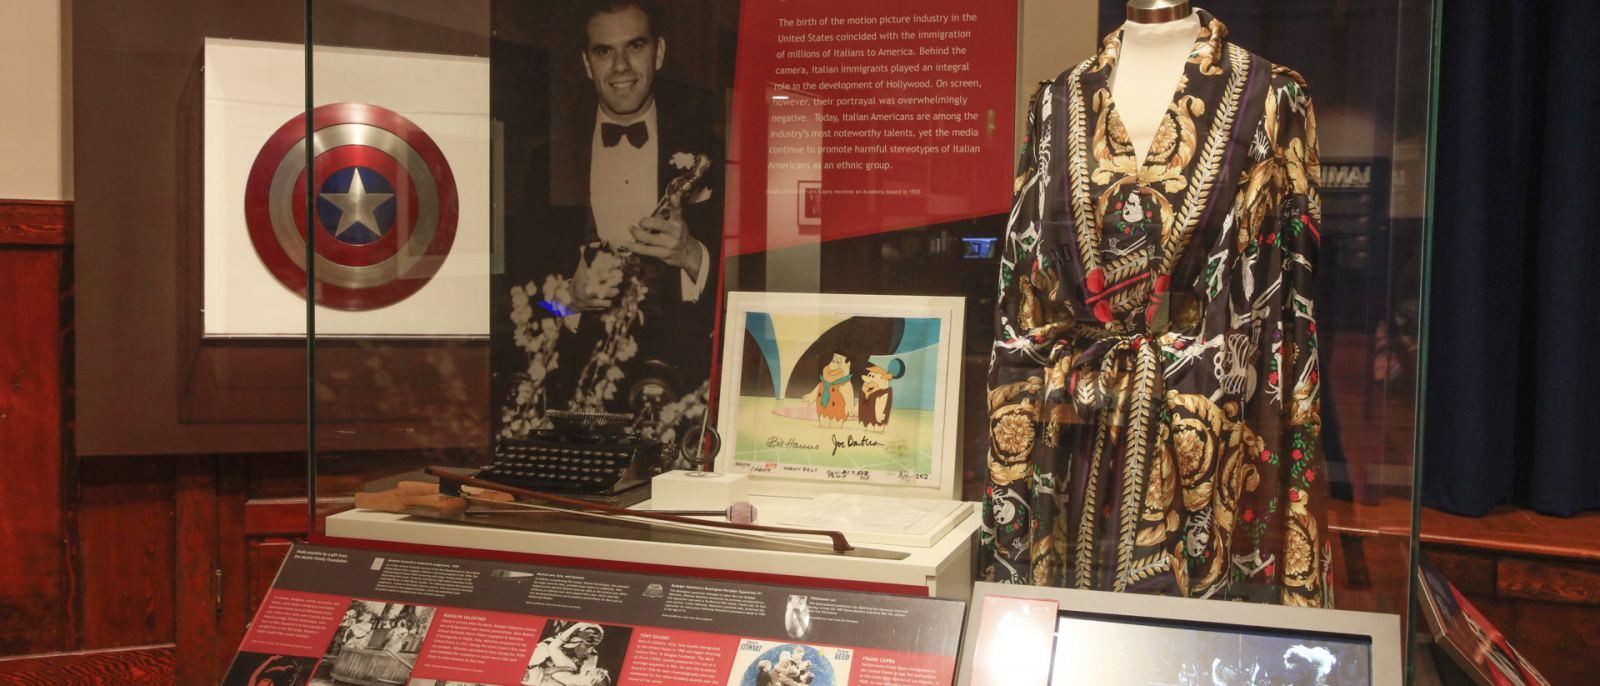 Exhibit at the Italian American Museum on Olvera Street